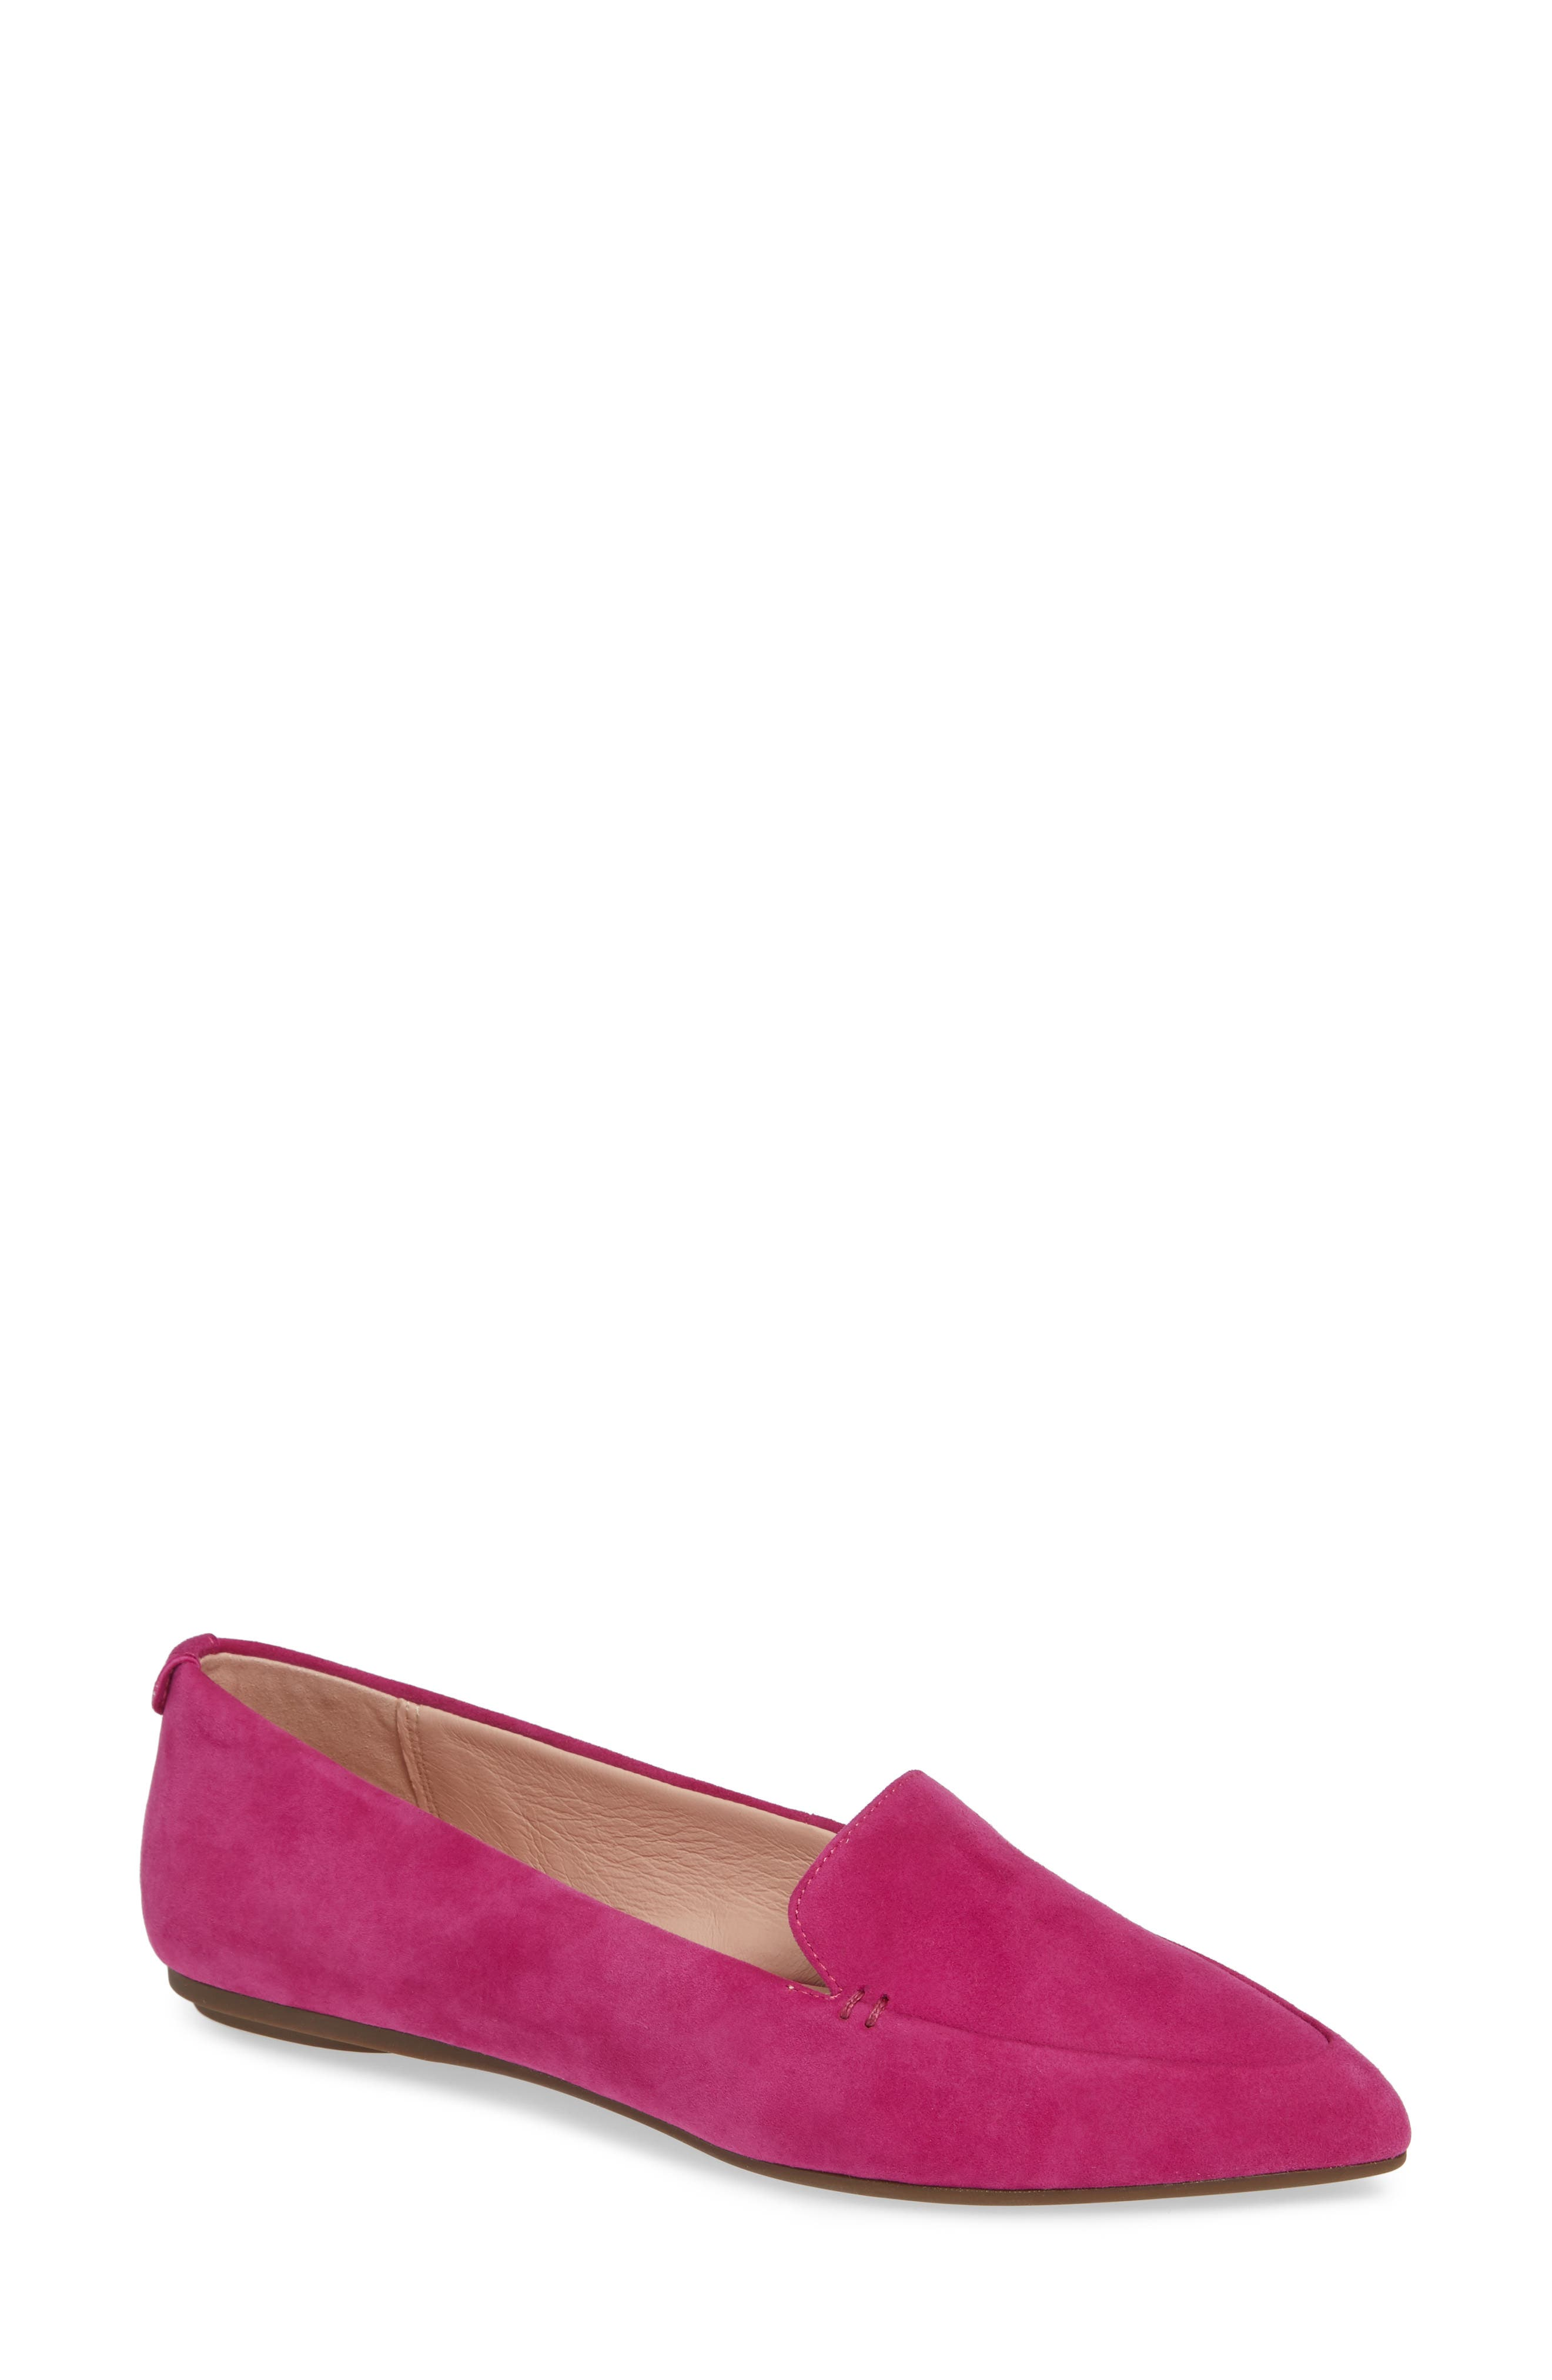 Taryn Rose Faye Pointy Toe Loafer- Pink